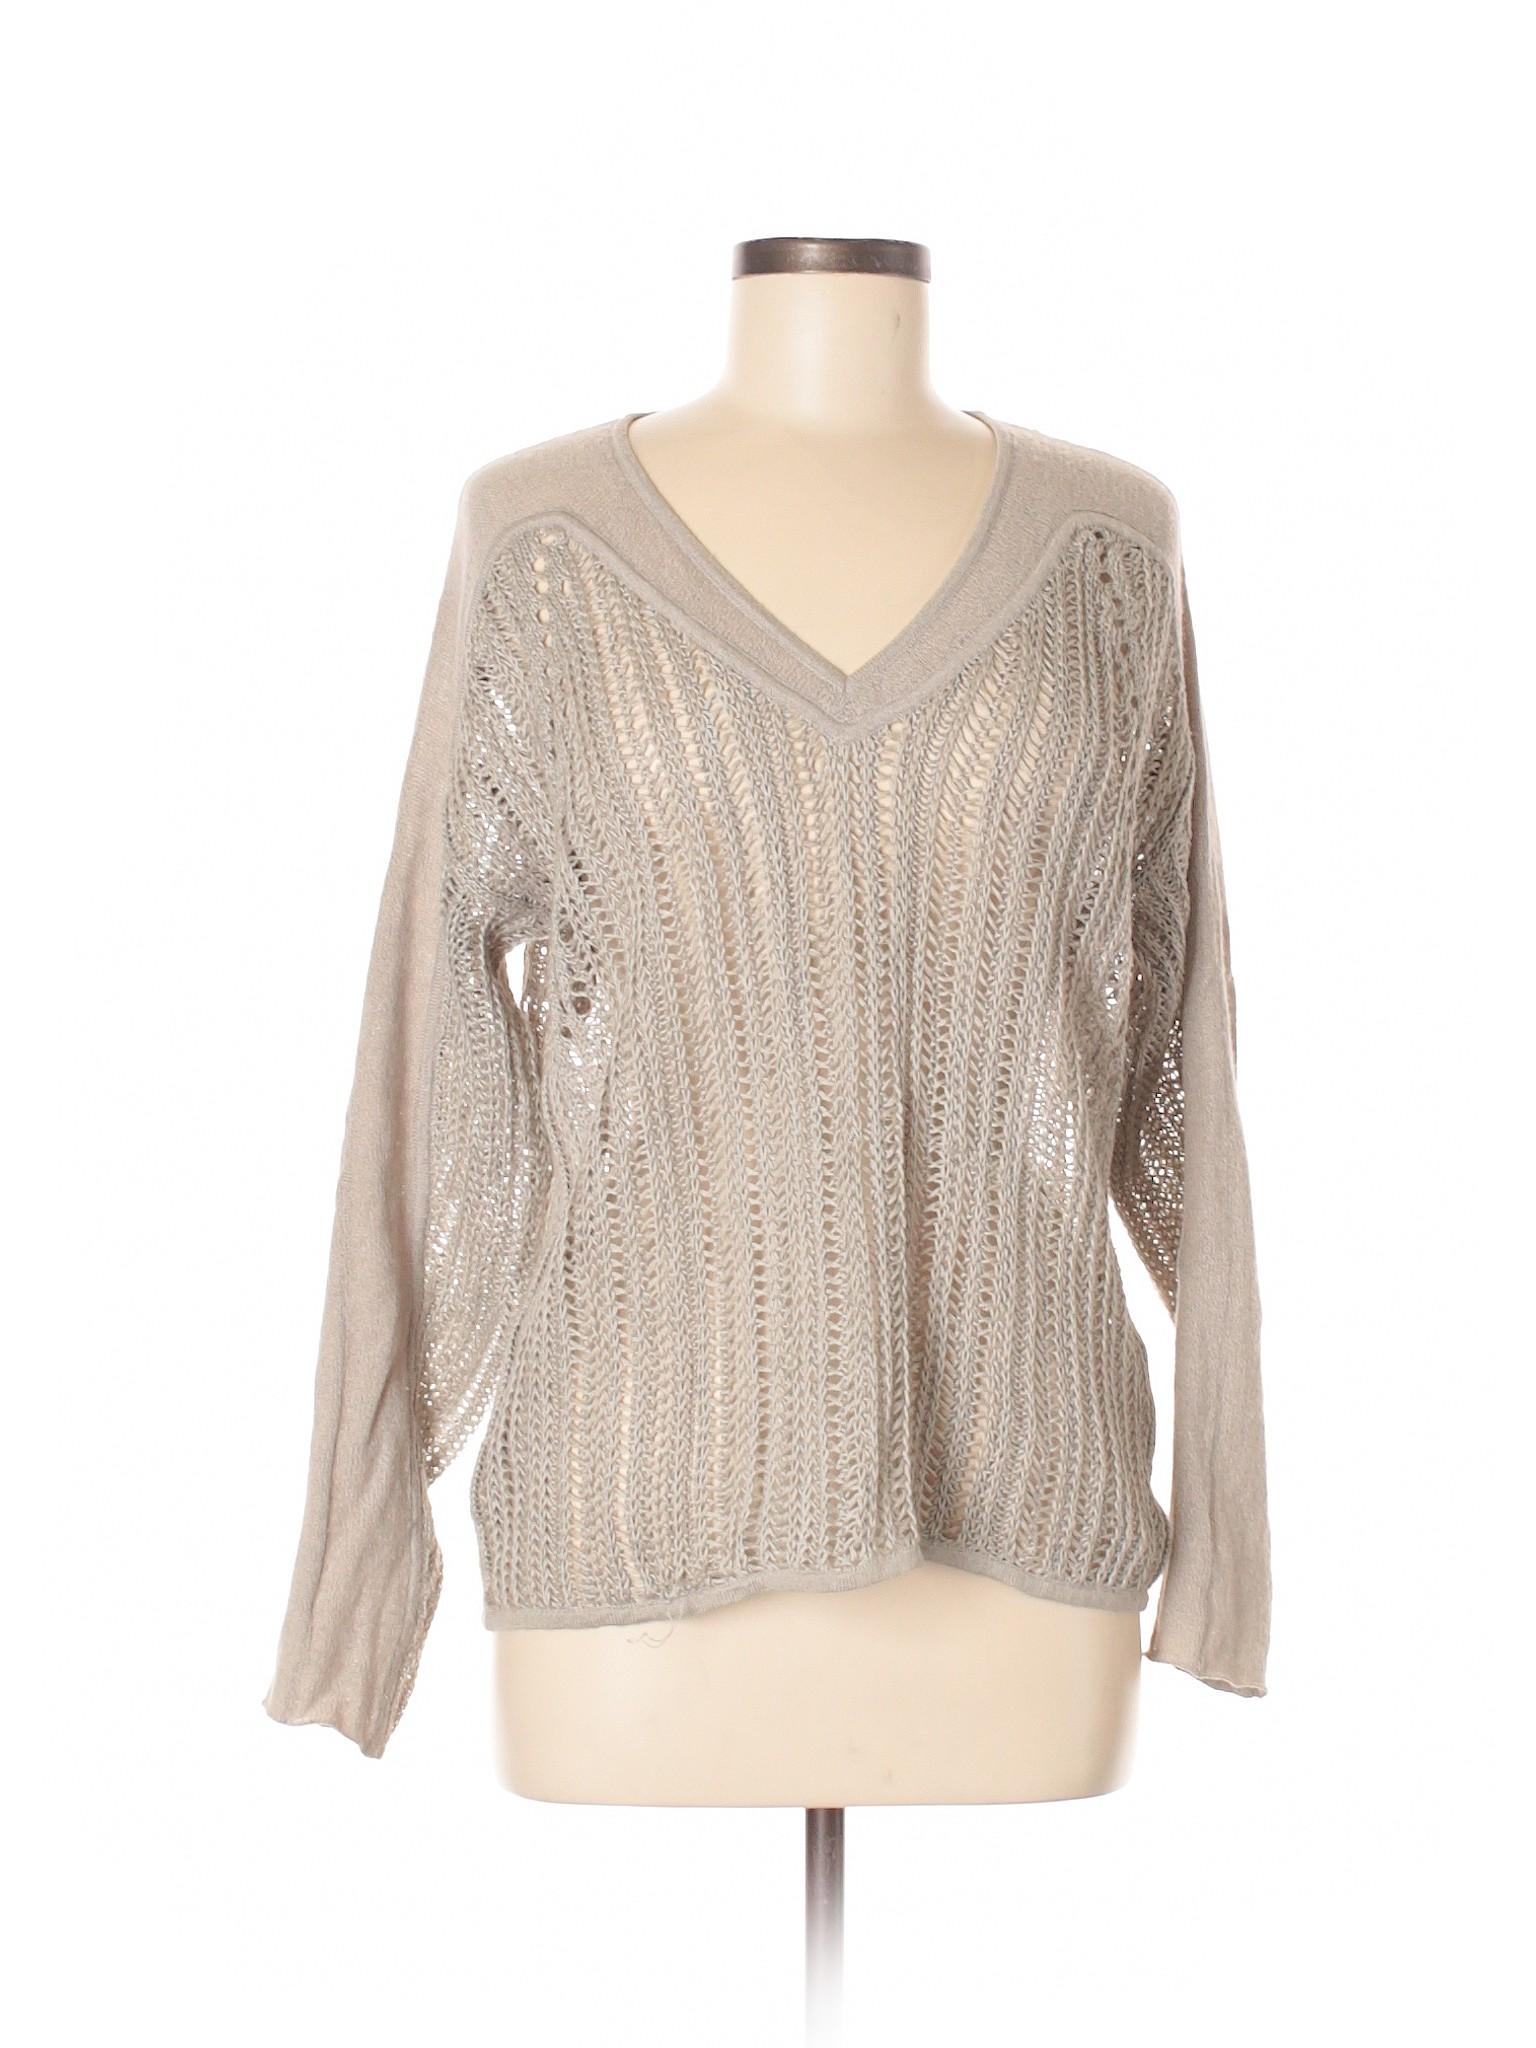 Helmut Boutique Sweater Lang Pullover Helmut Lang Sweater Boutique Pullover Boutique Pullover Lang Helmut Sweater Boutique PPExnq6